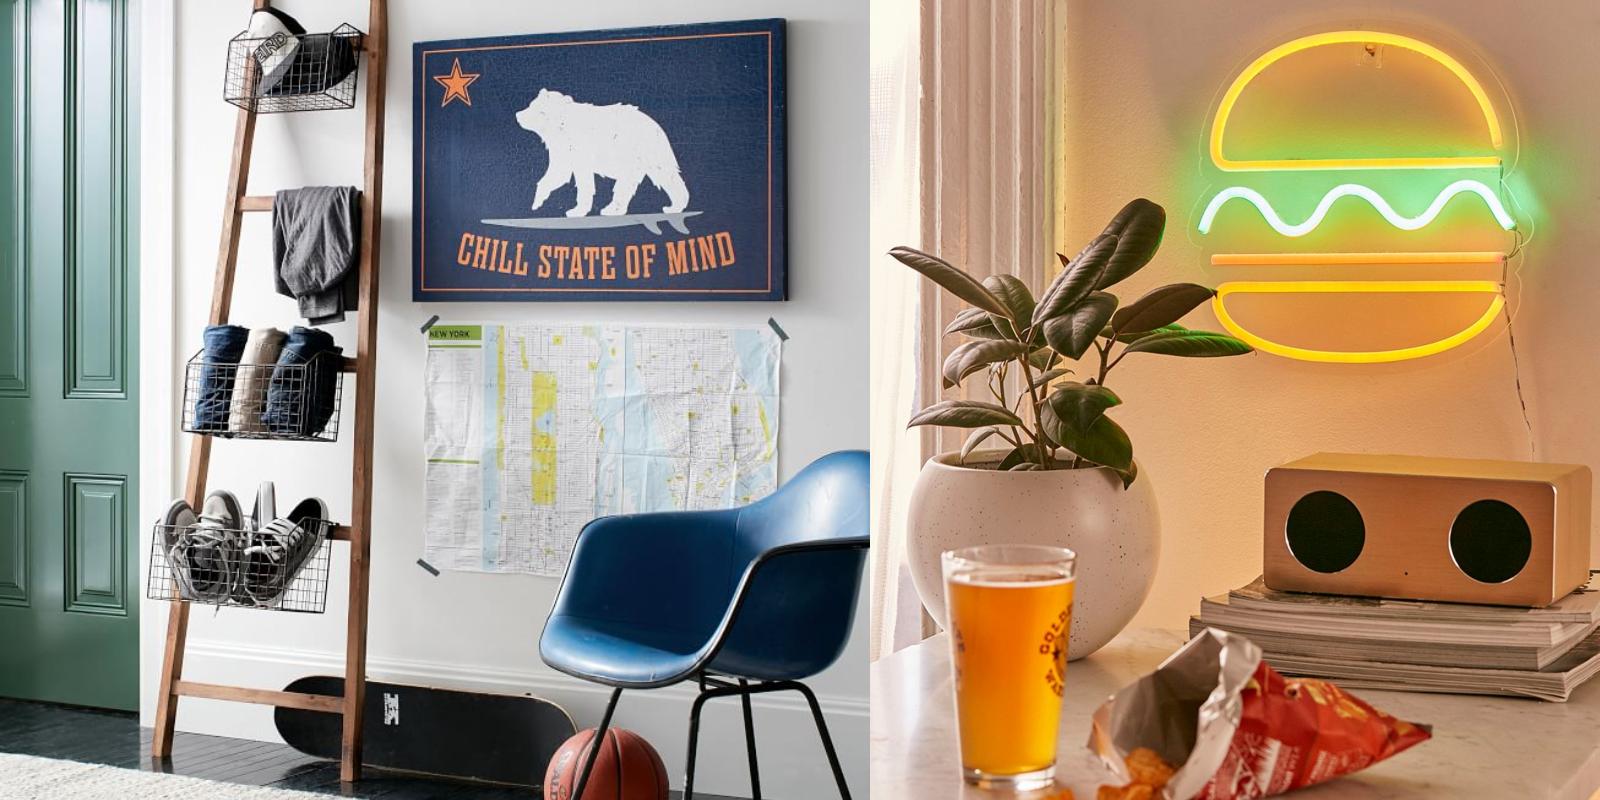 image & 11 Dorm Room Ideas For Guys - Cool Dorm Room Decor Guys Will Love